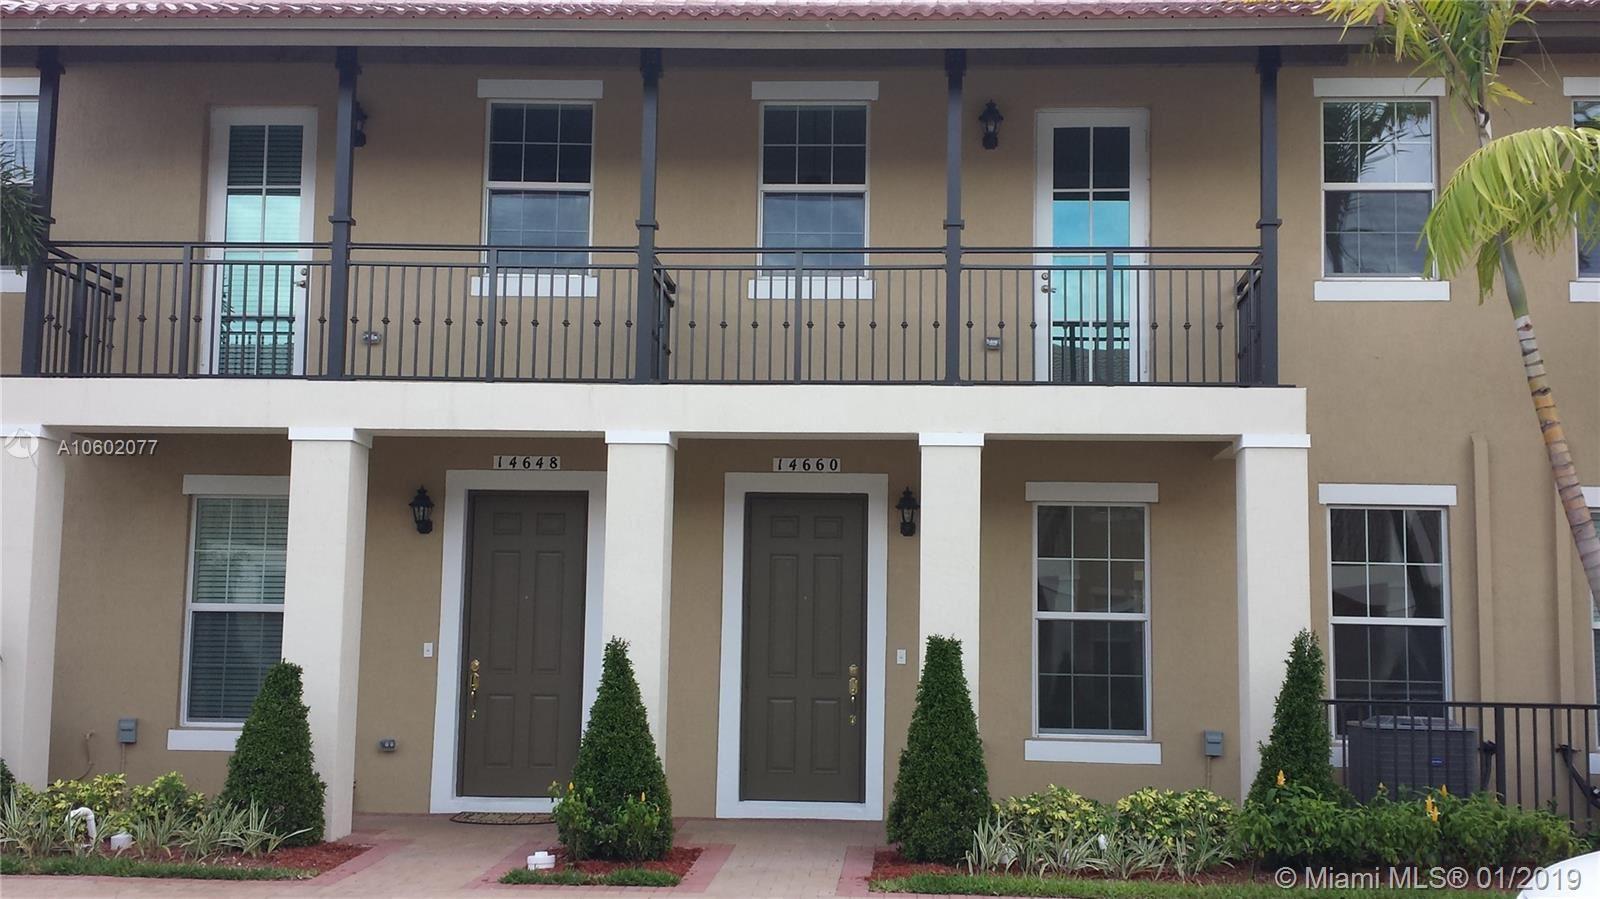 14660 SW 14th St #14660, Pembroke Pines, FL 33027 - MLS#: A10602077